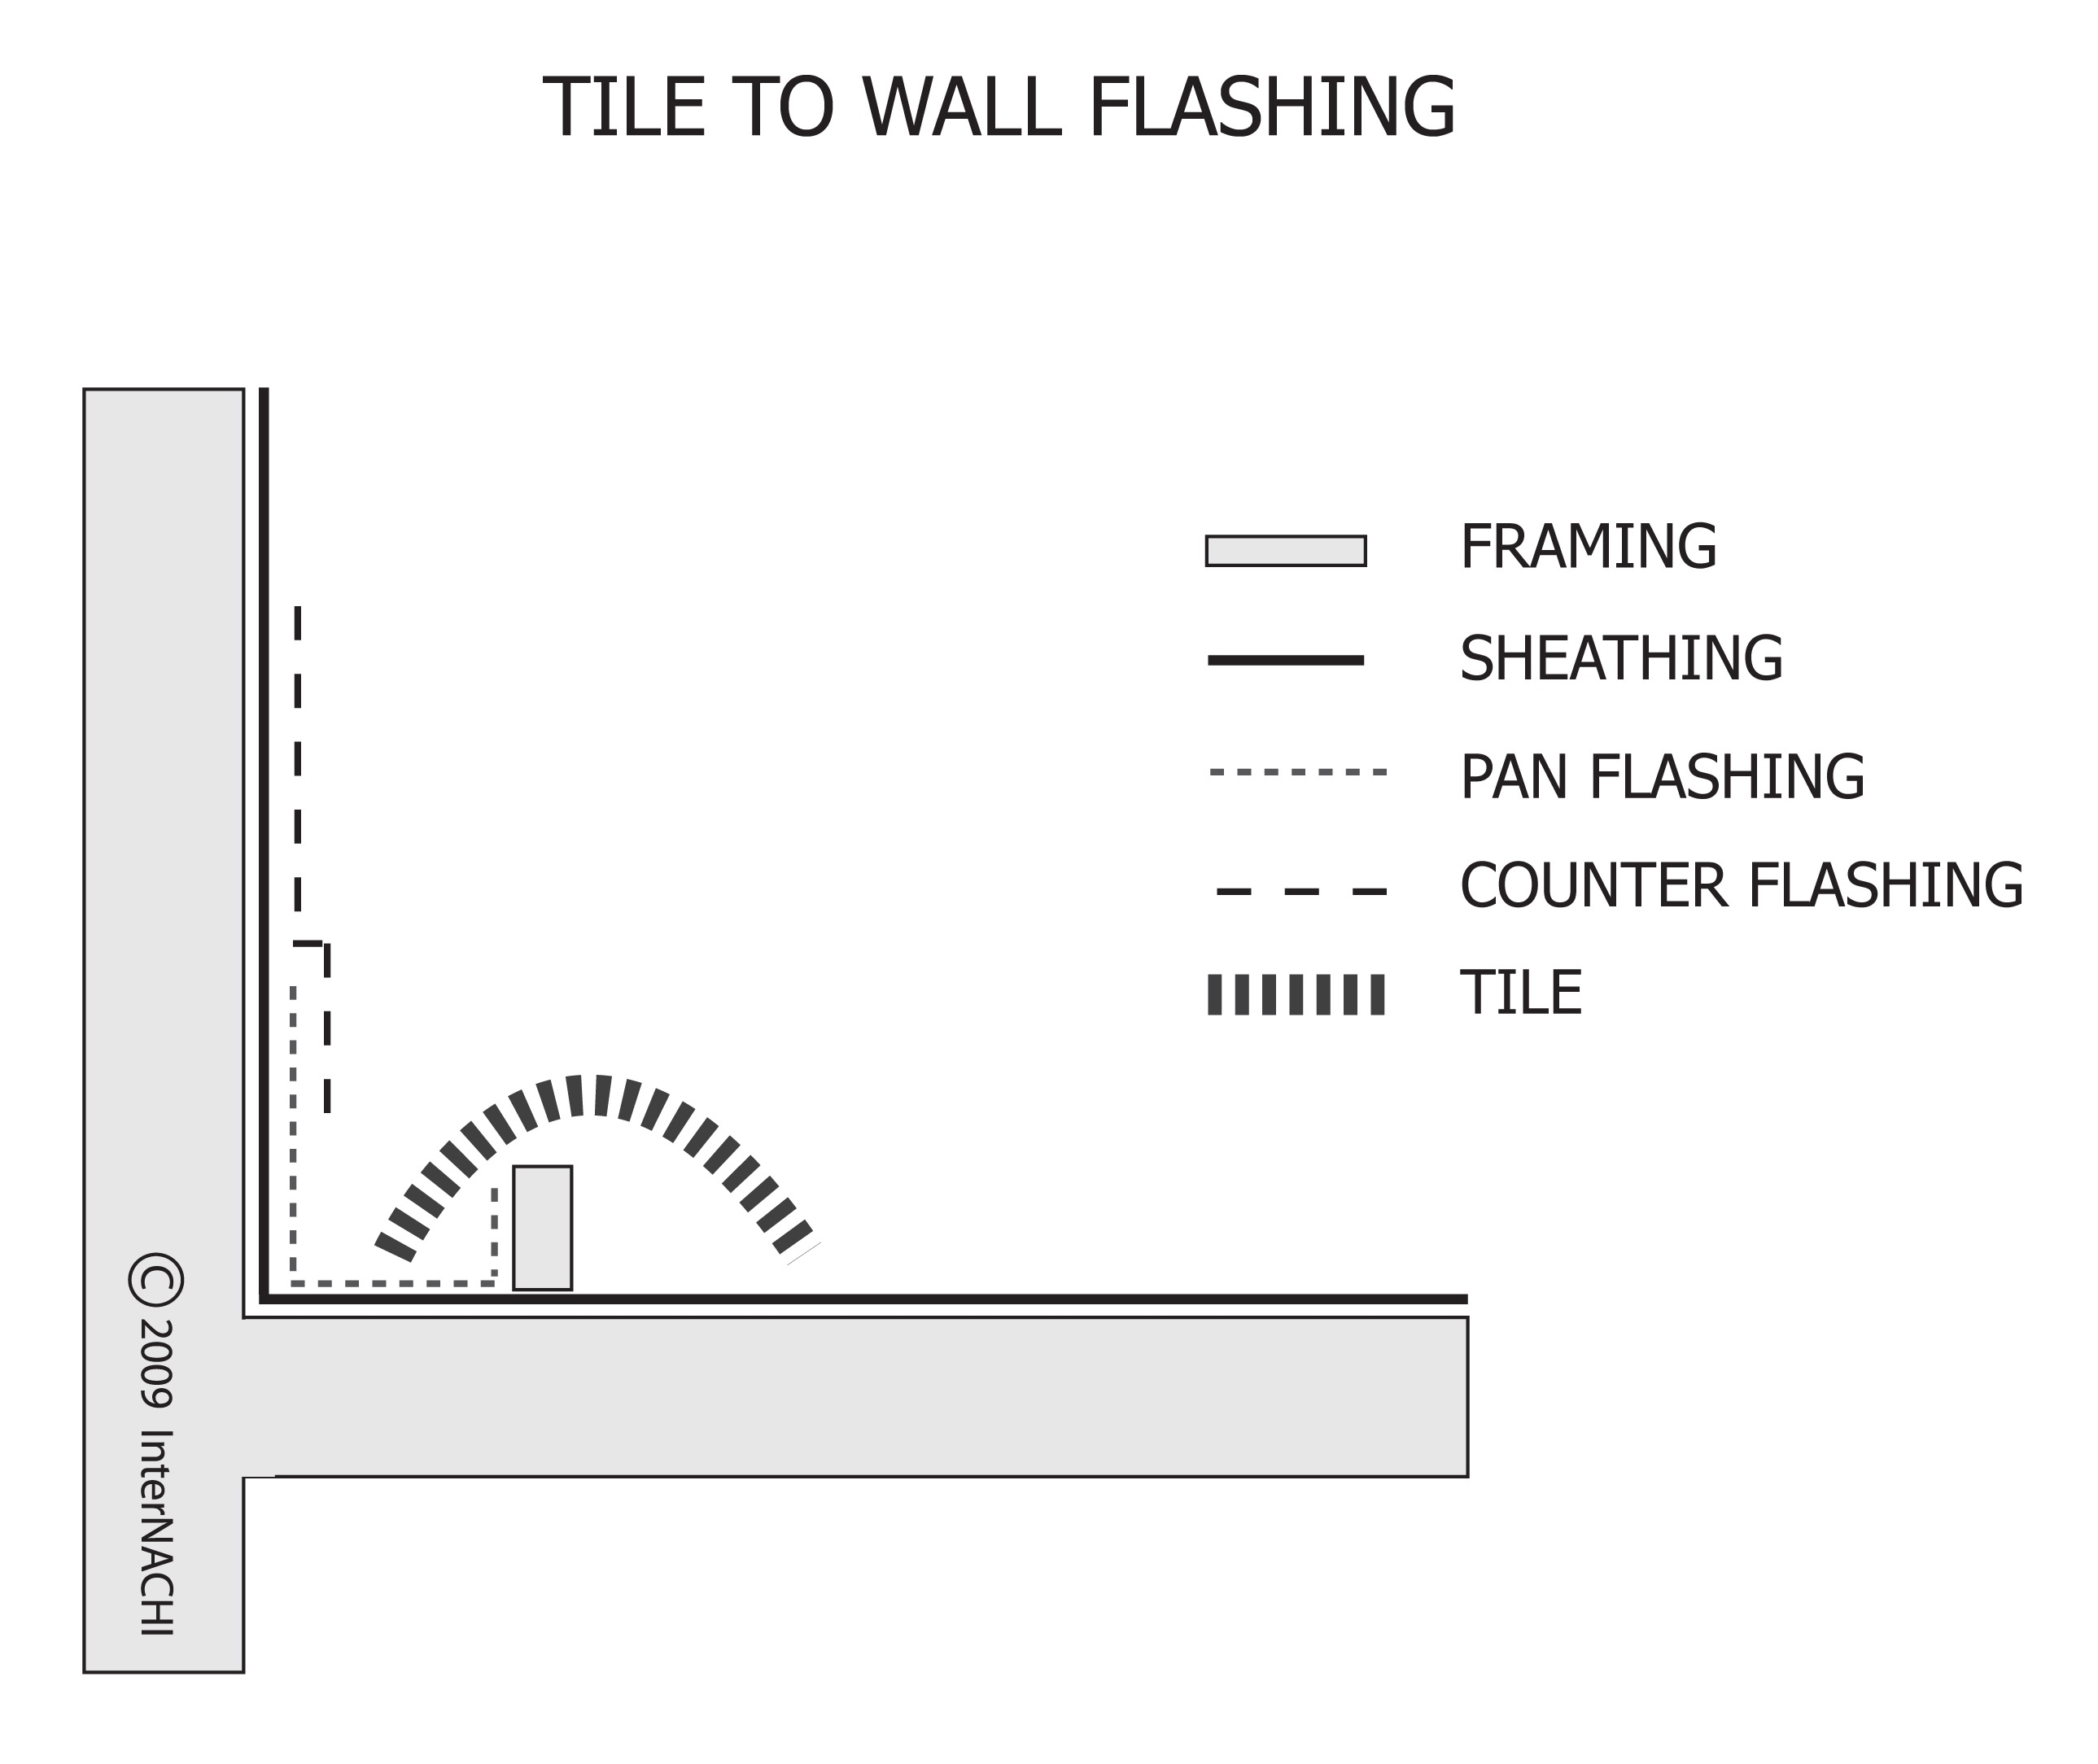 Tile to wall flashing.